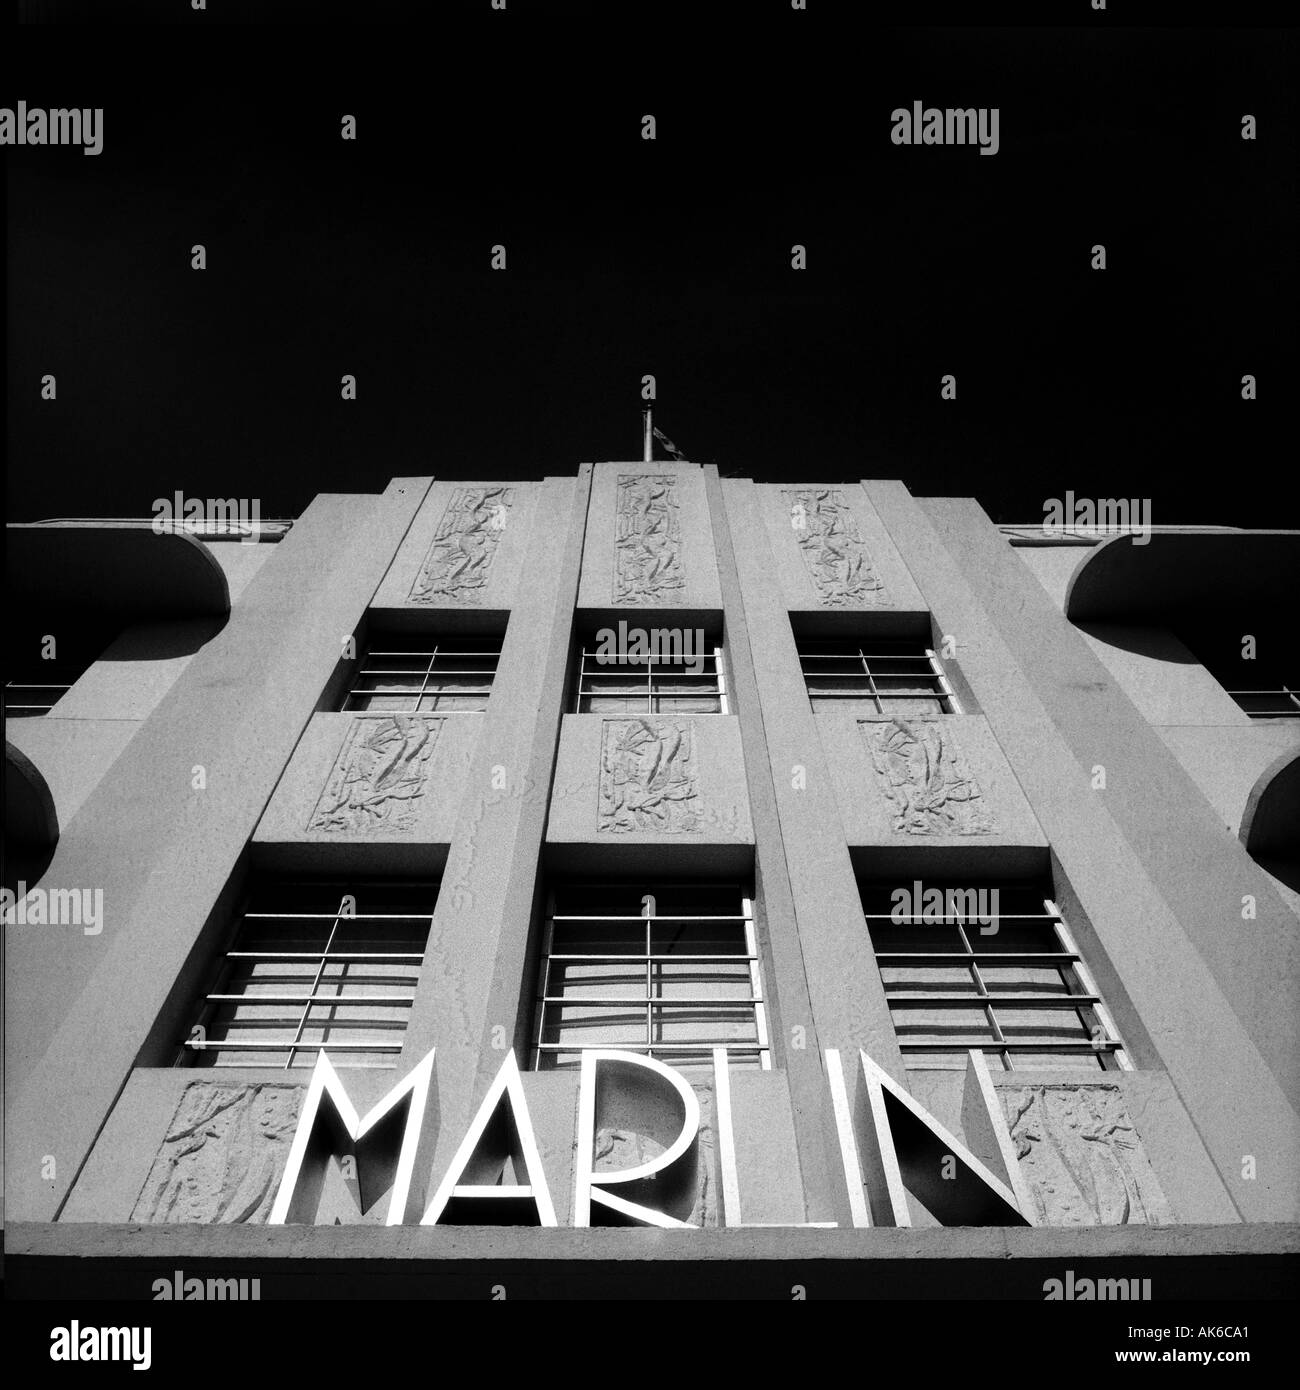 Facade of the Marlin hotel in Miami s South Beach Art Deco District Stock Photo